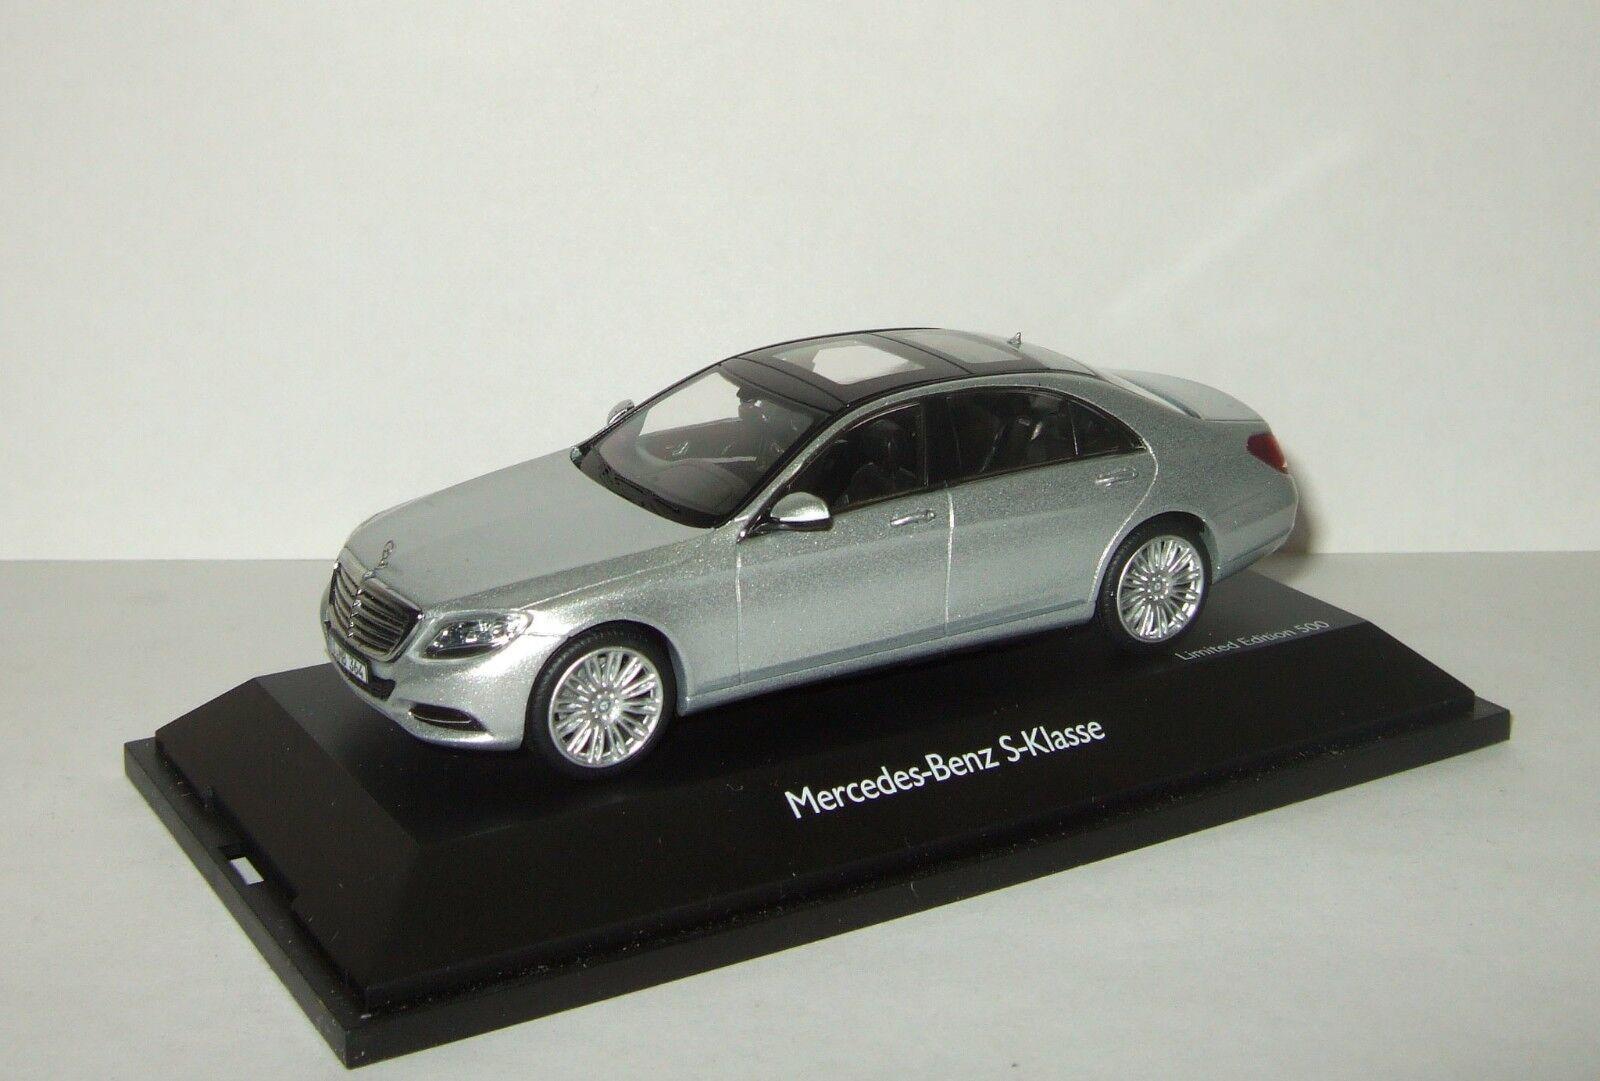 1 43 Schuco Mercedes Benz W222 V222 Clase S 2013 LIMOUSINE plata 450753600